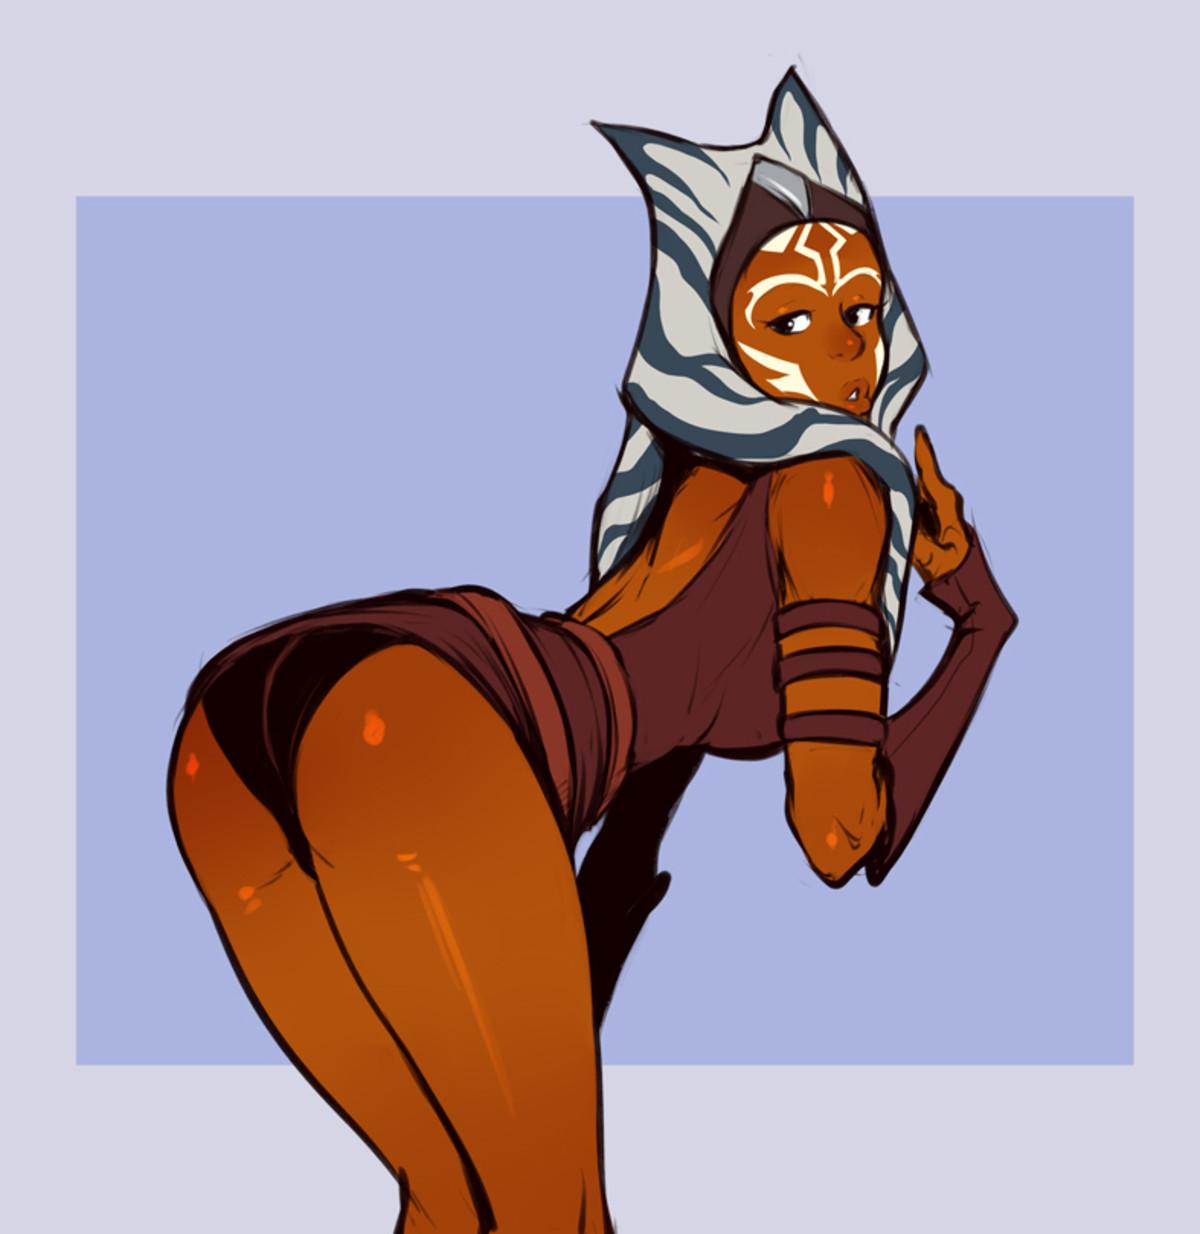 Tano. .. Orange booty best Jedi booty. Tano Orange booty best Jedi